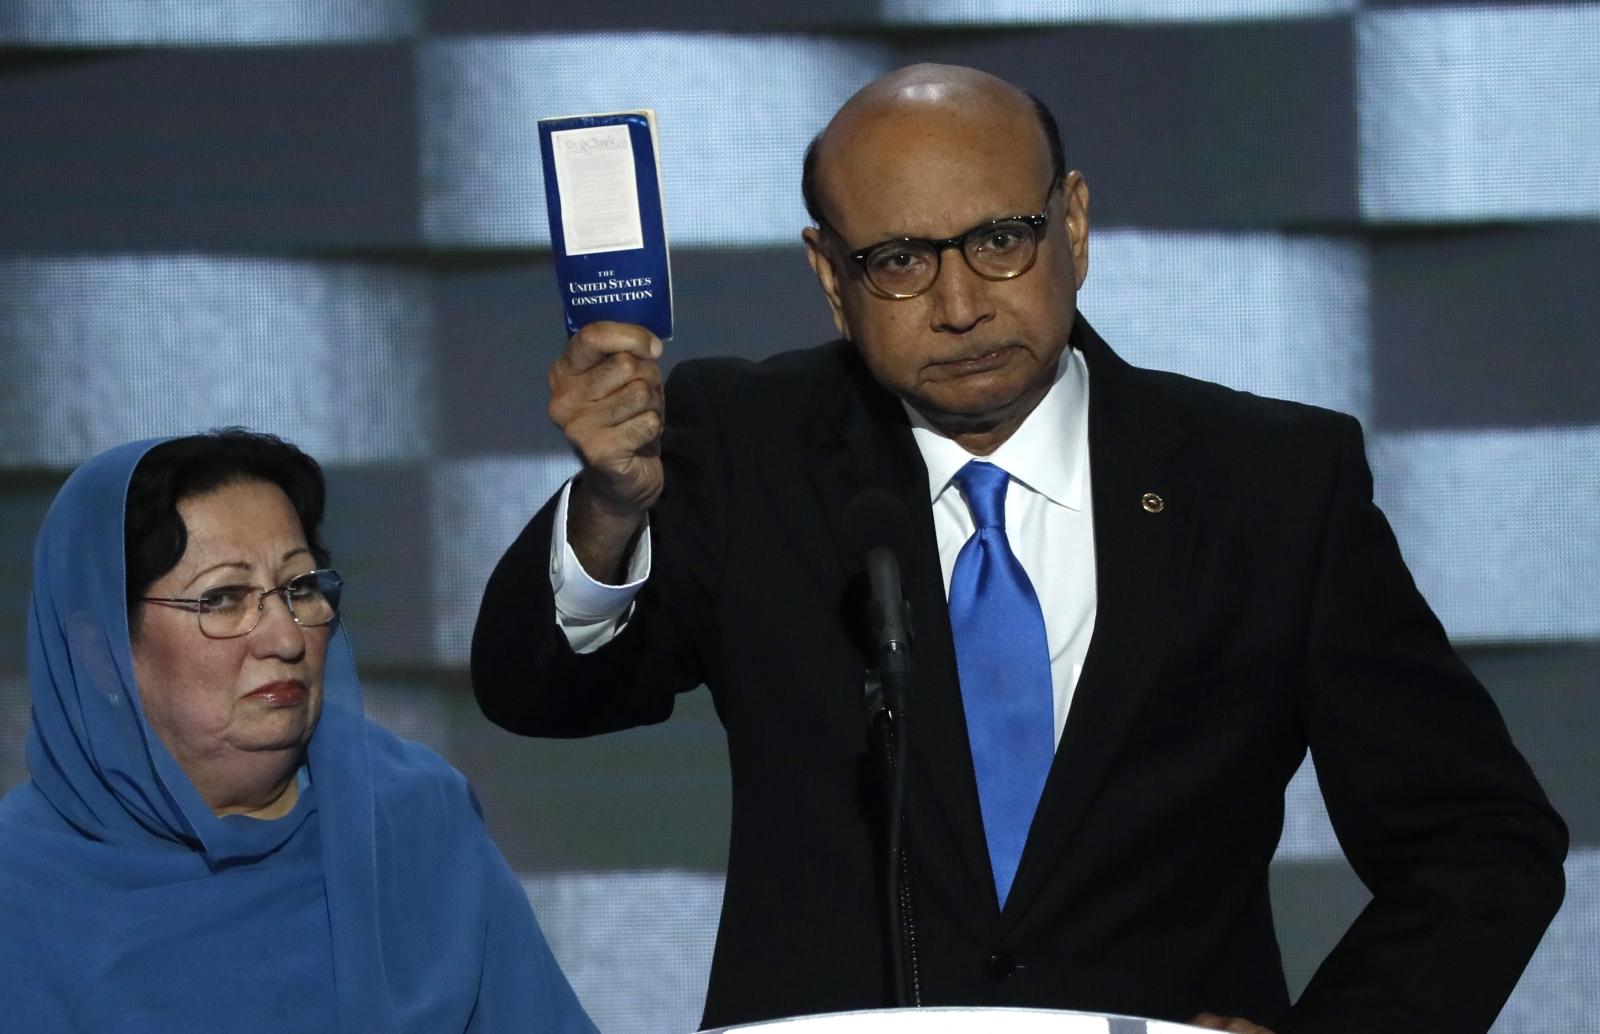 Khizr Khan at the DNC